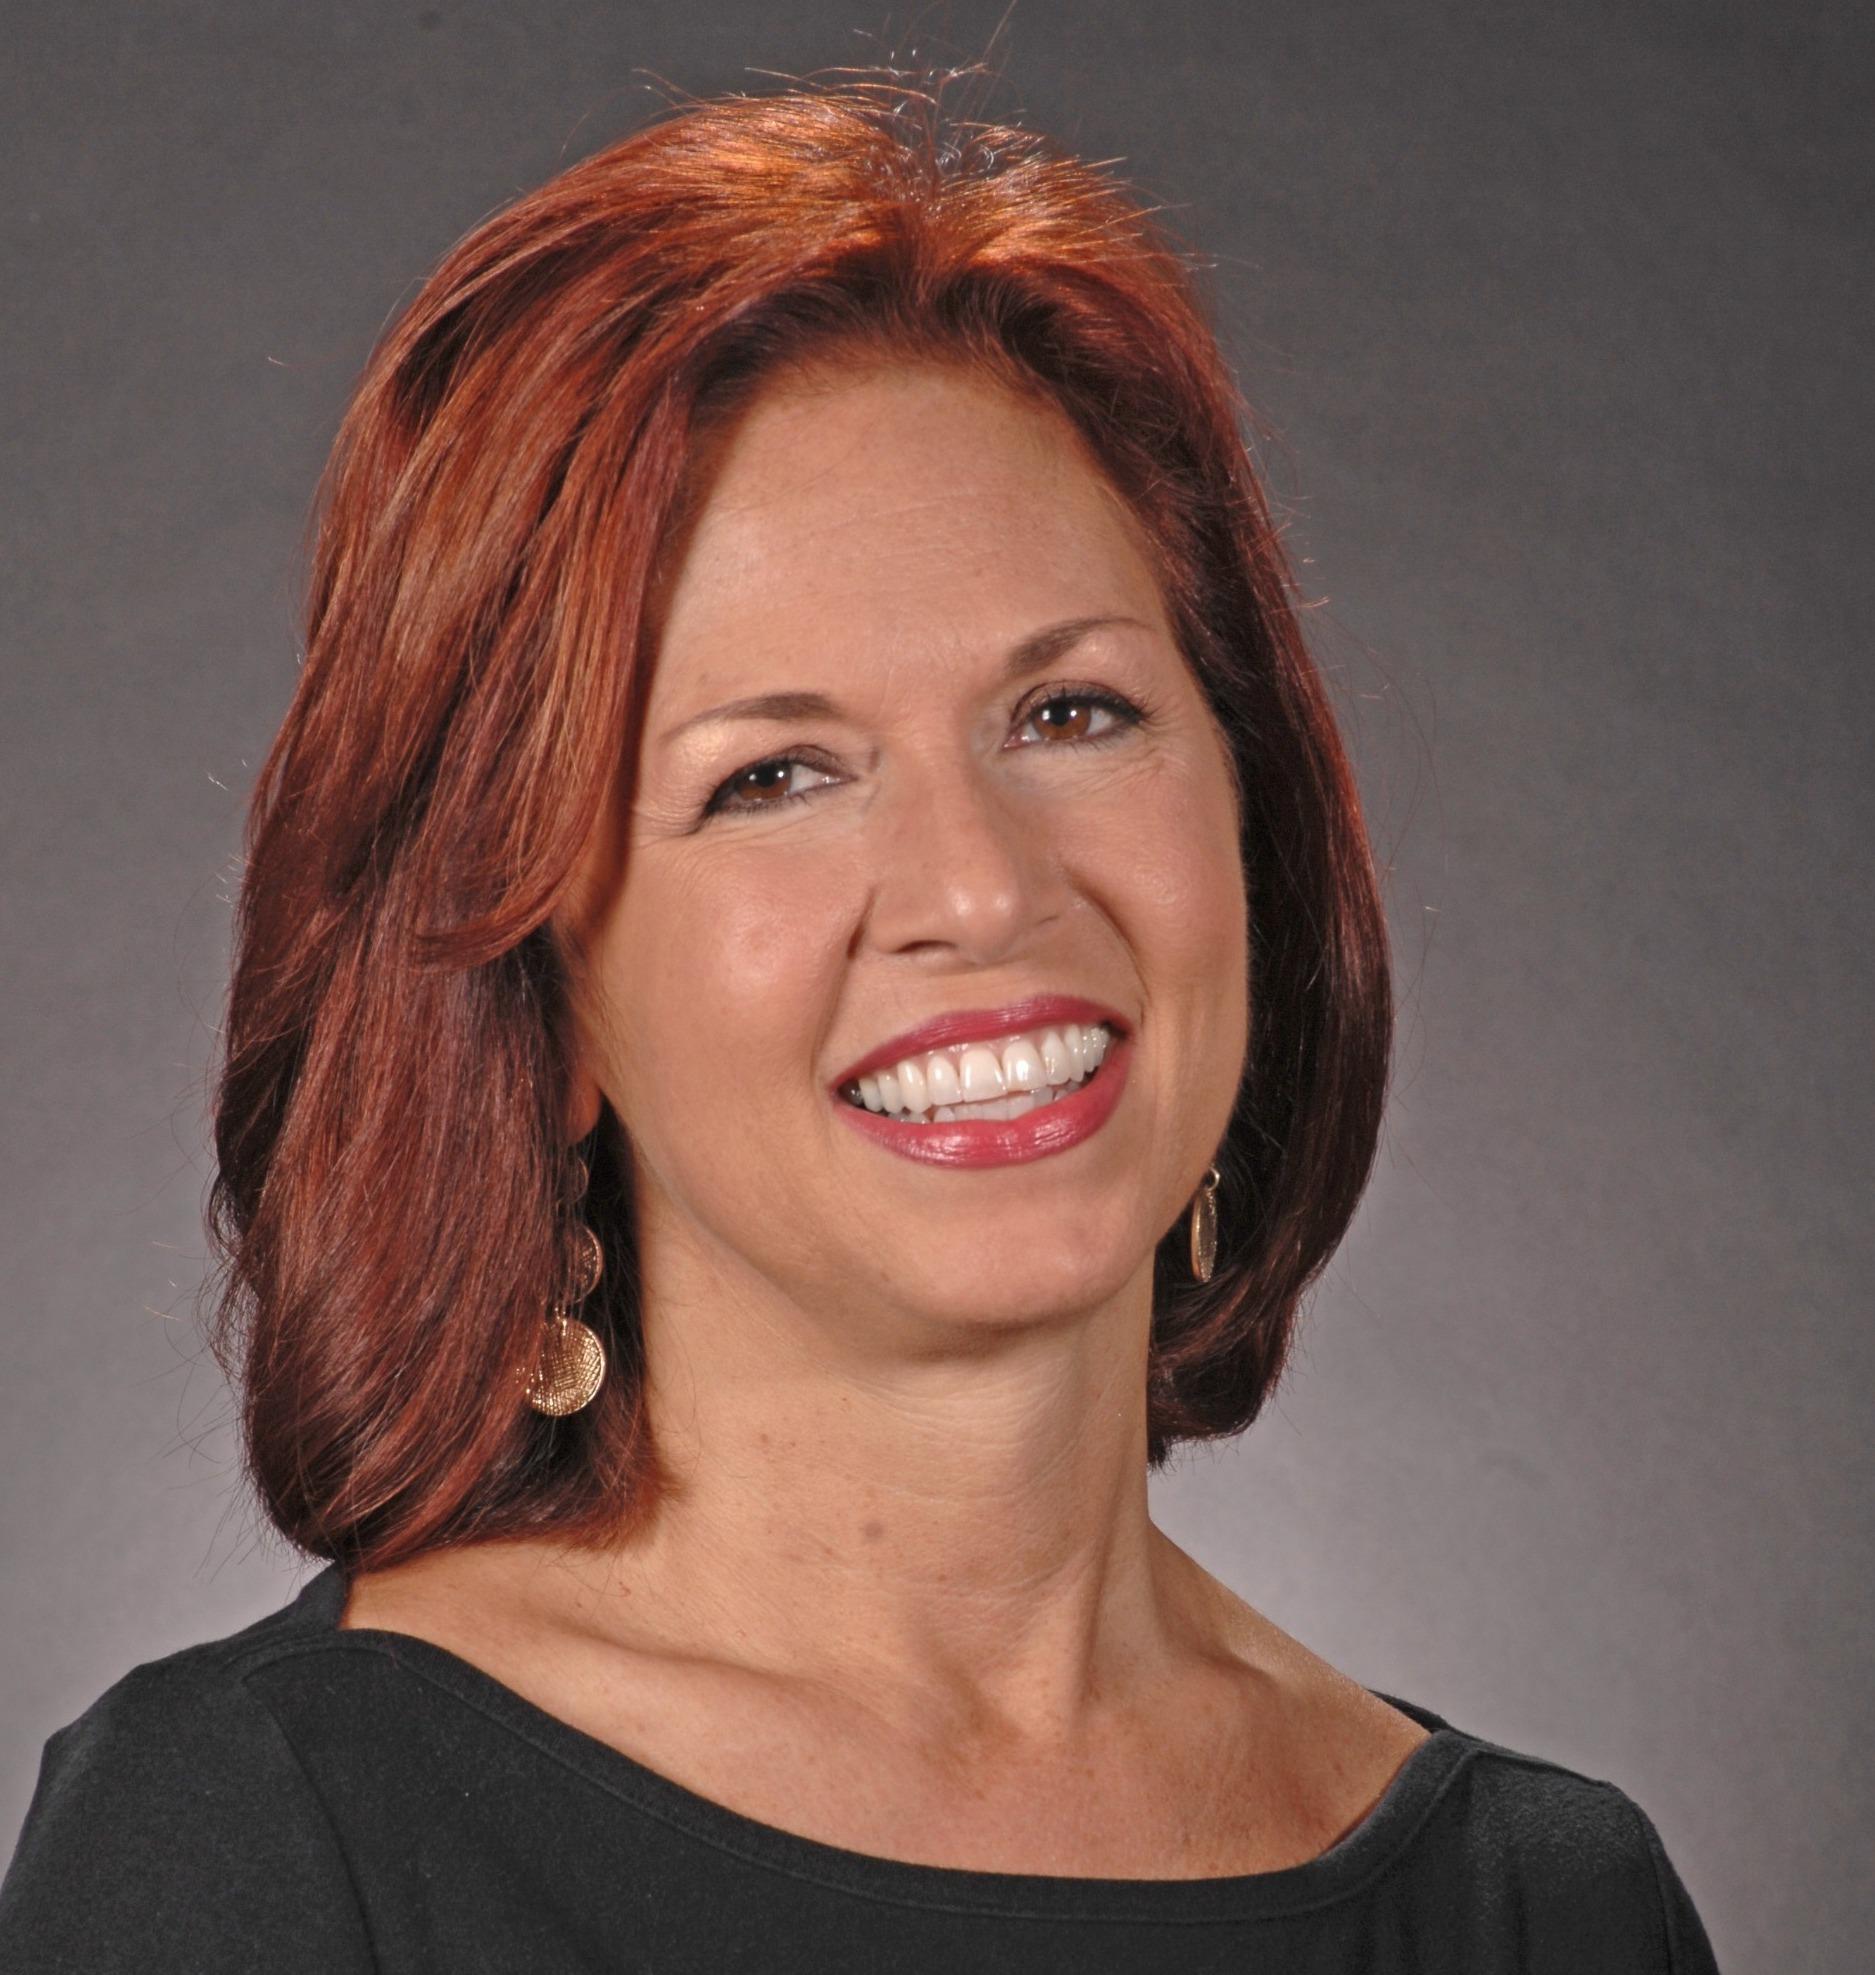 Heidi Morano